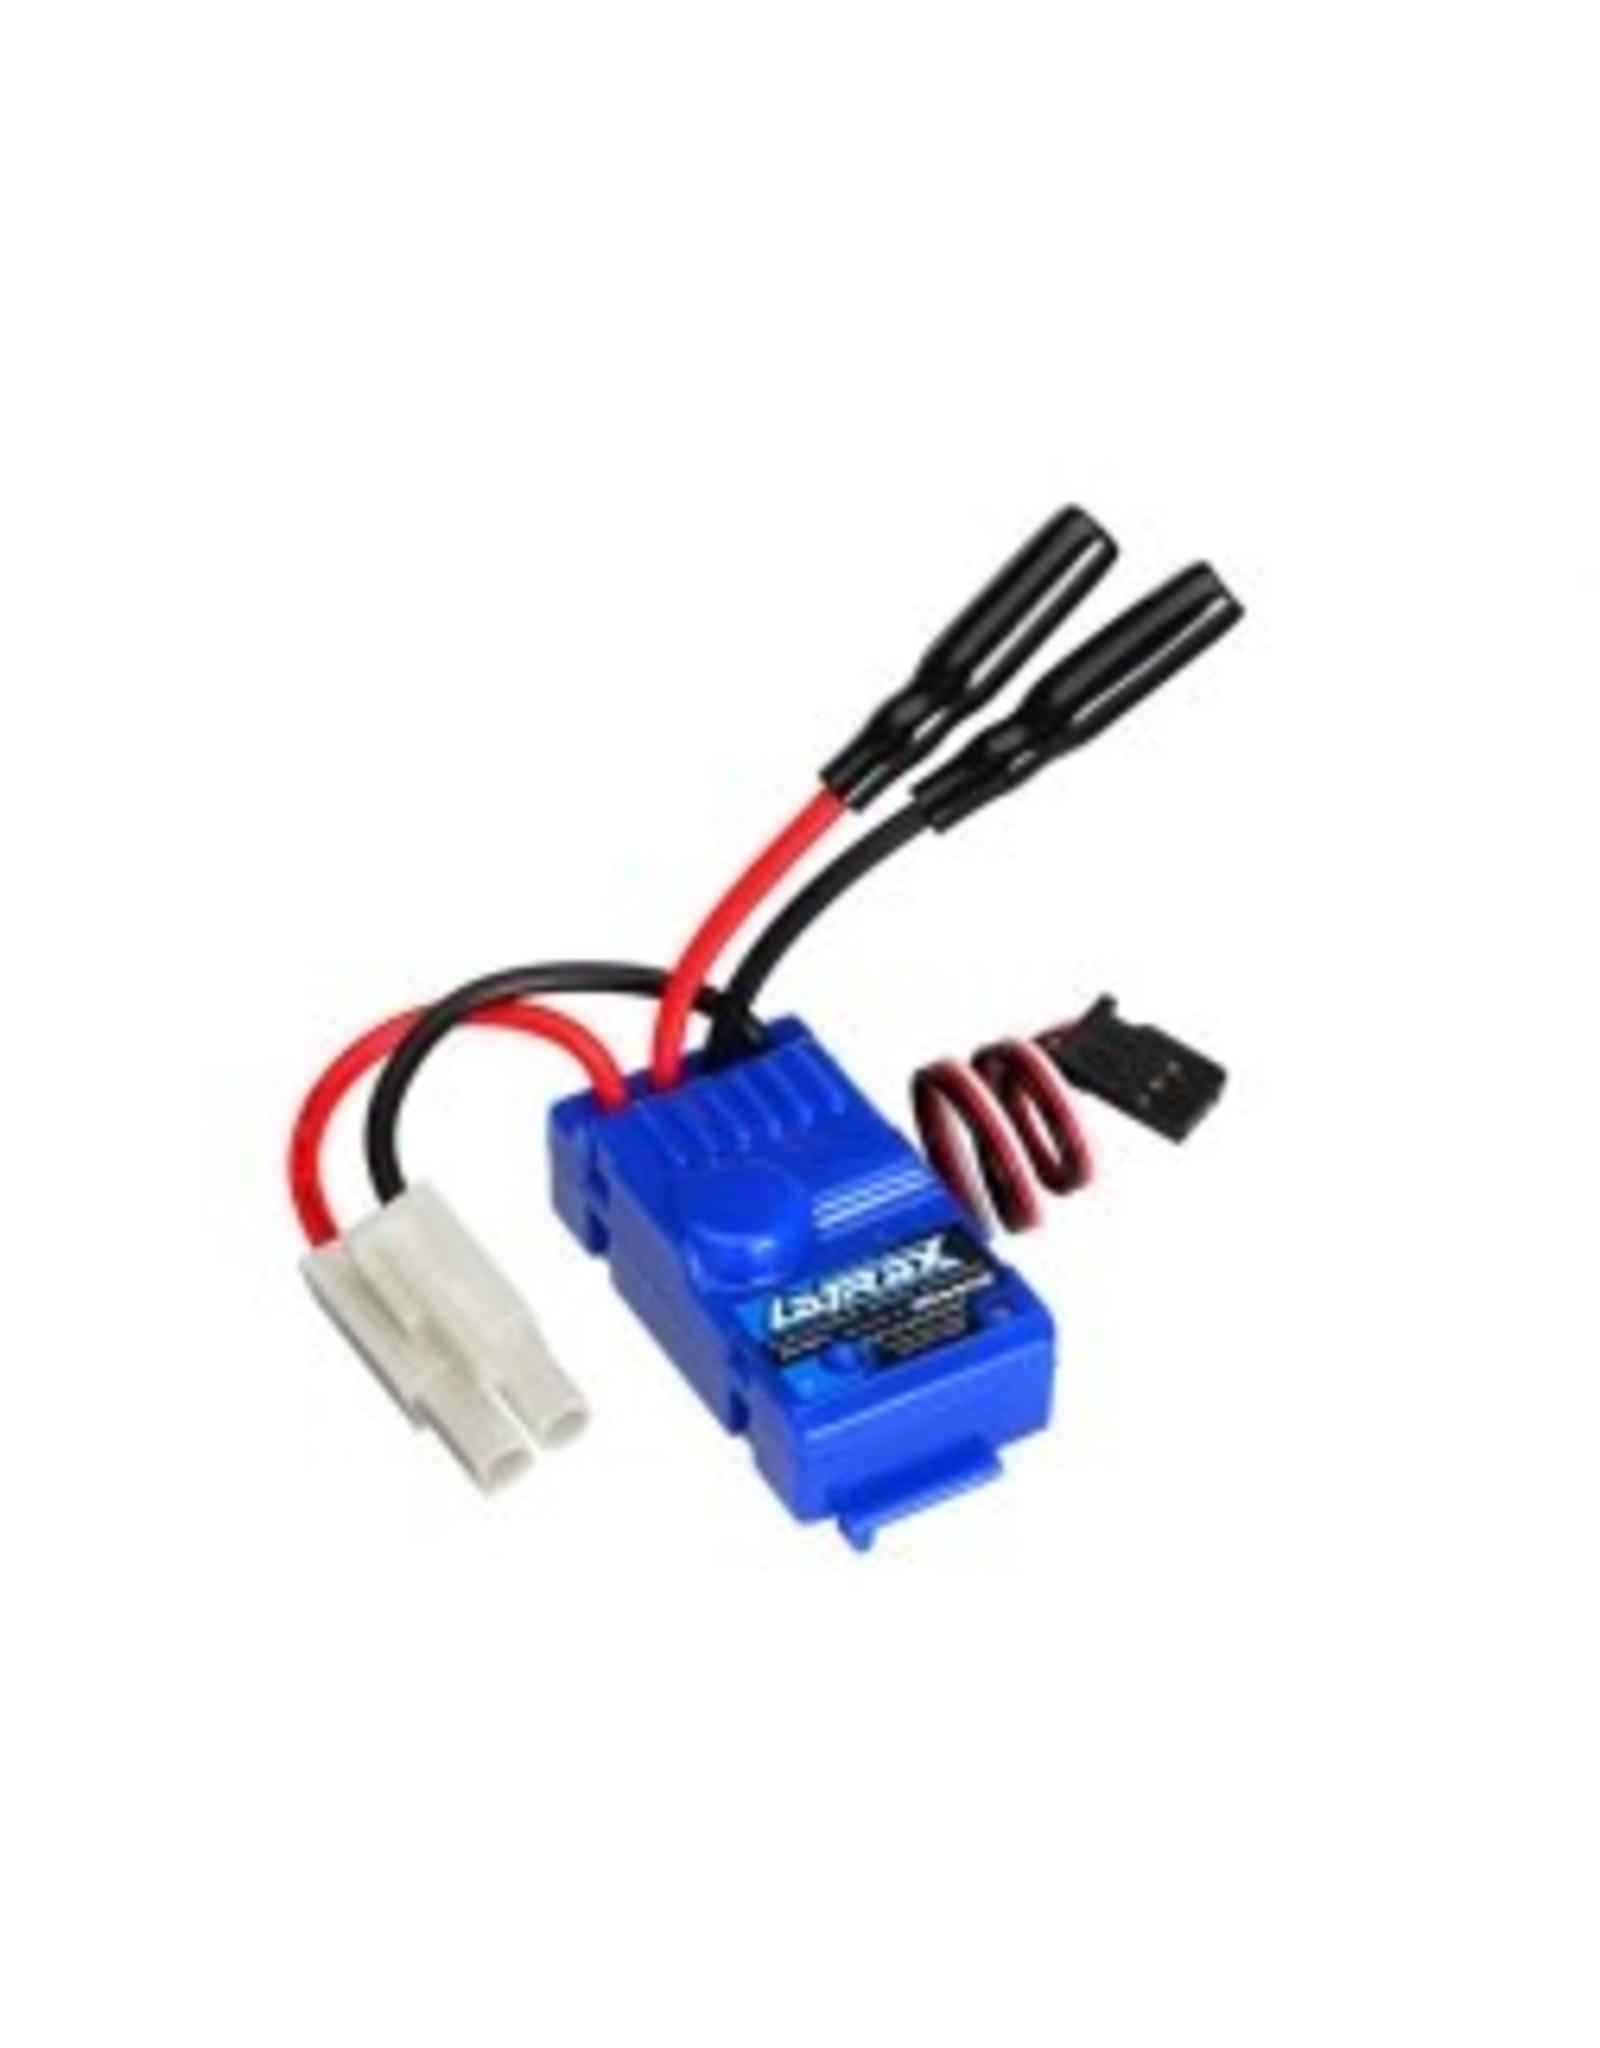 Traxxas Electronic Speed Control, Waterproof: LaTrax - Tamiya Plug (TRA3045x)